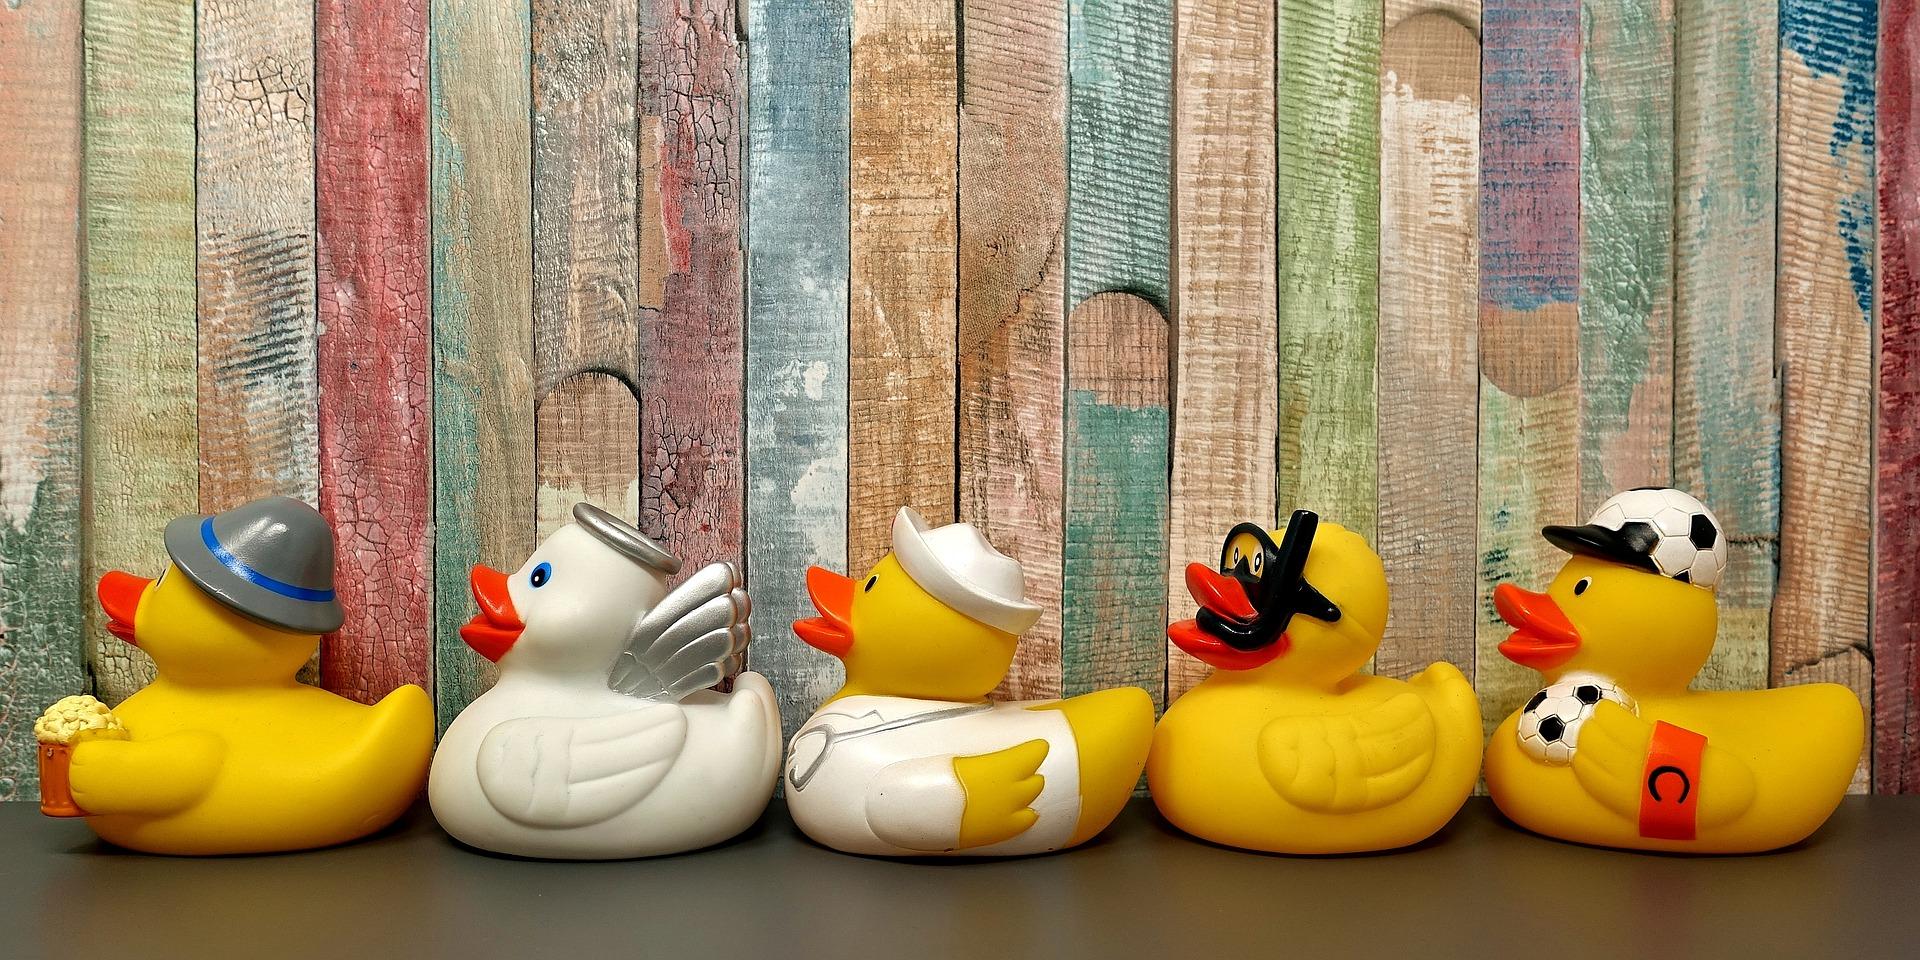 2rubber-ducks-3412065_1920